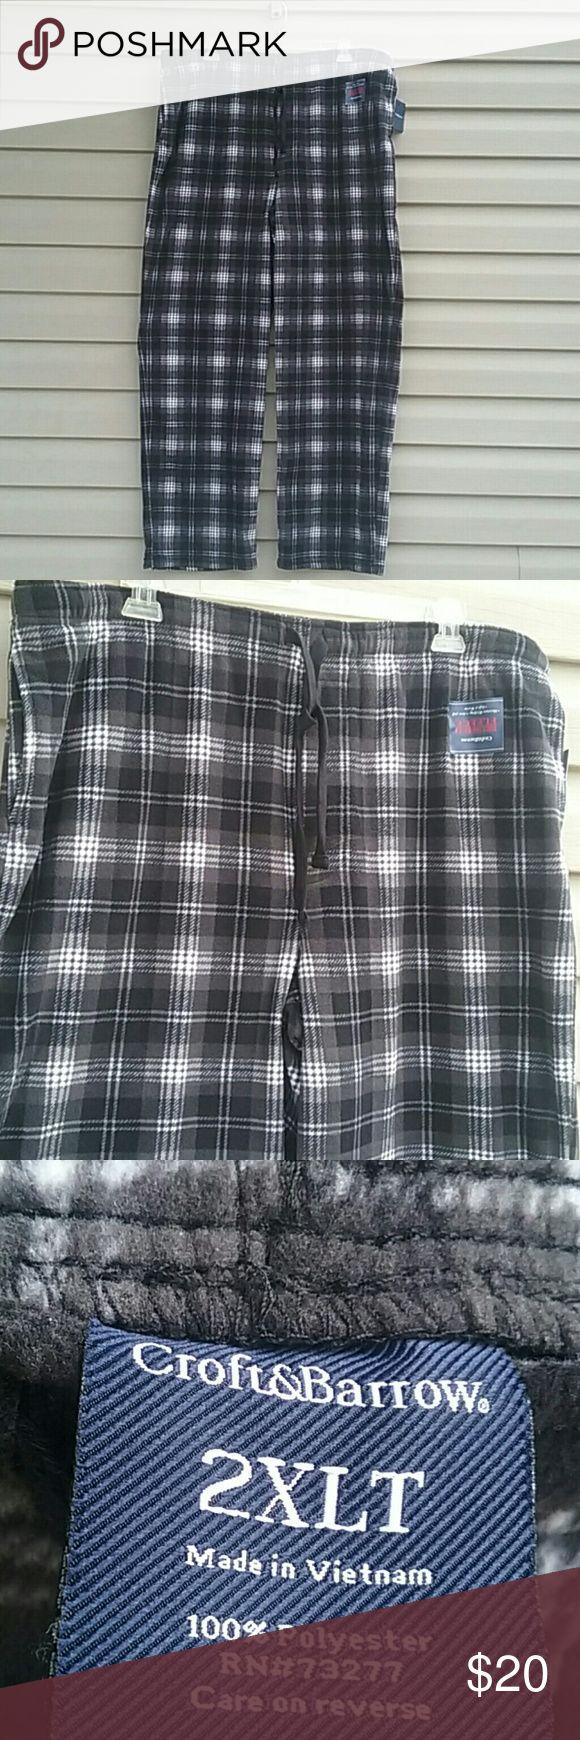 Croft & Barrow fleece pants NWT Mens Croft & Barrow fleece lounge pants, black and gray plaid size 2XLT croft & barrow Pants